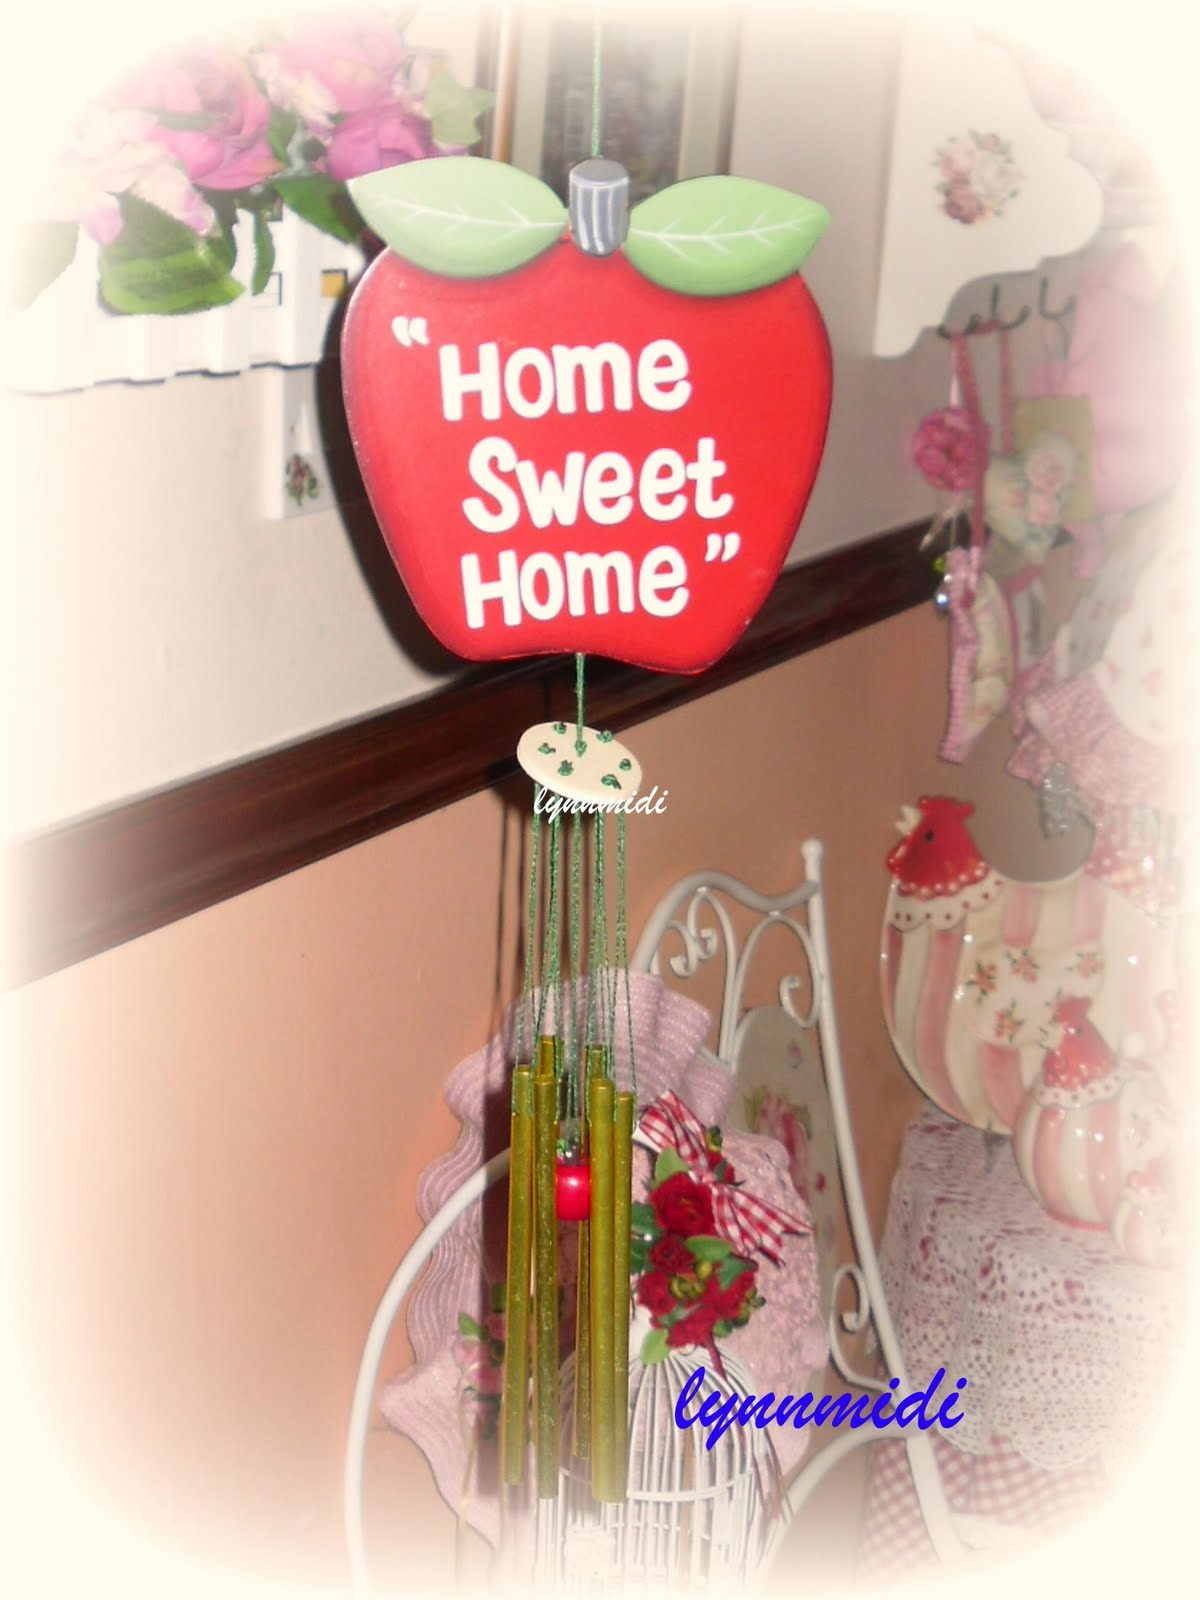 http://3.bp.blogspot.com/_vvqJ-N8IMK8/S73pUnrtLAI/AAAAAAAABYI/dMt_9Qq4lMs/s1600/apple+3.jpg